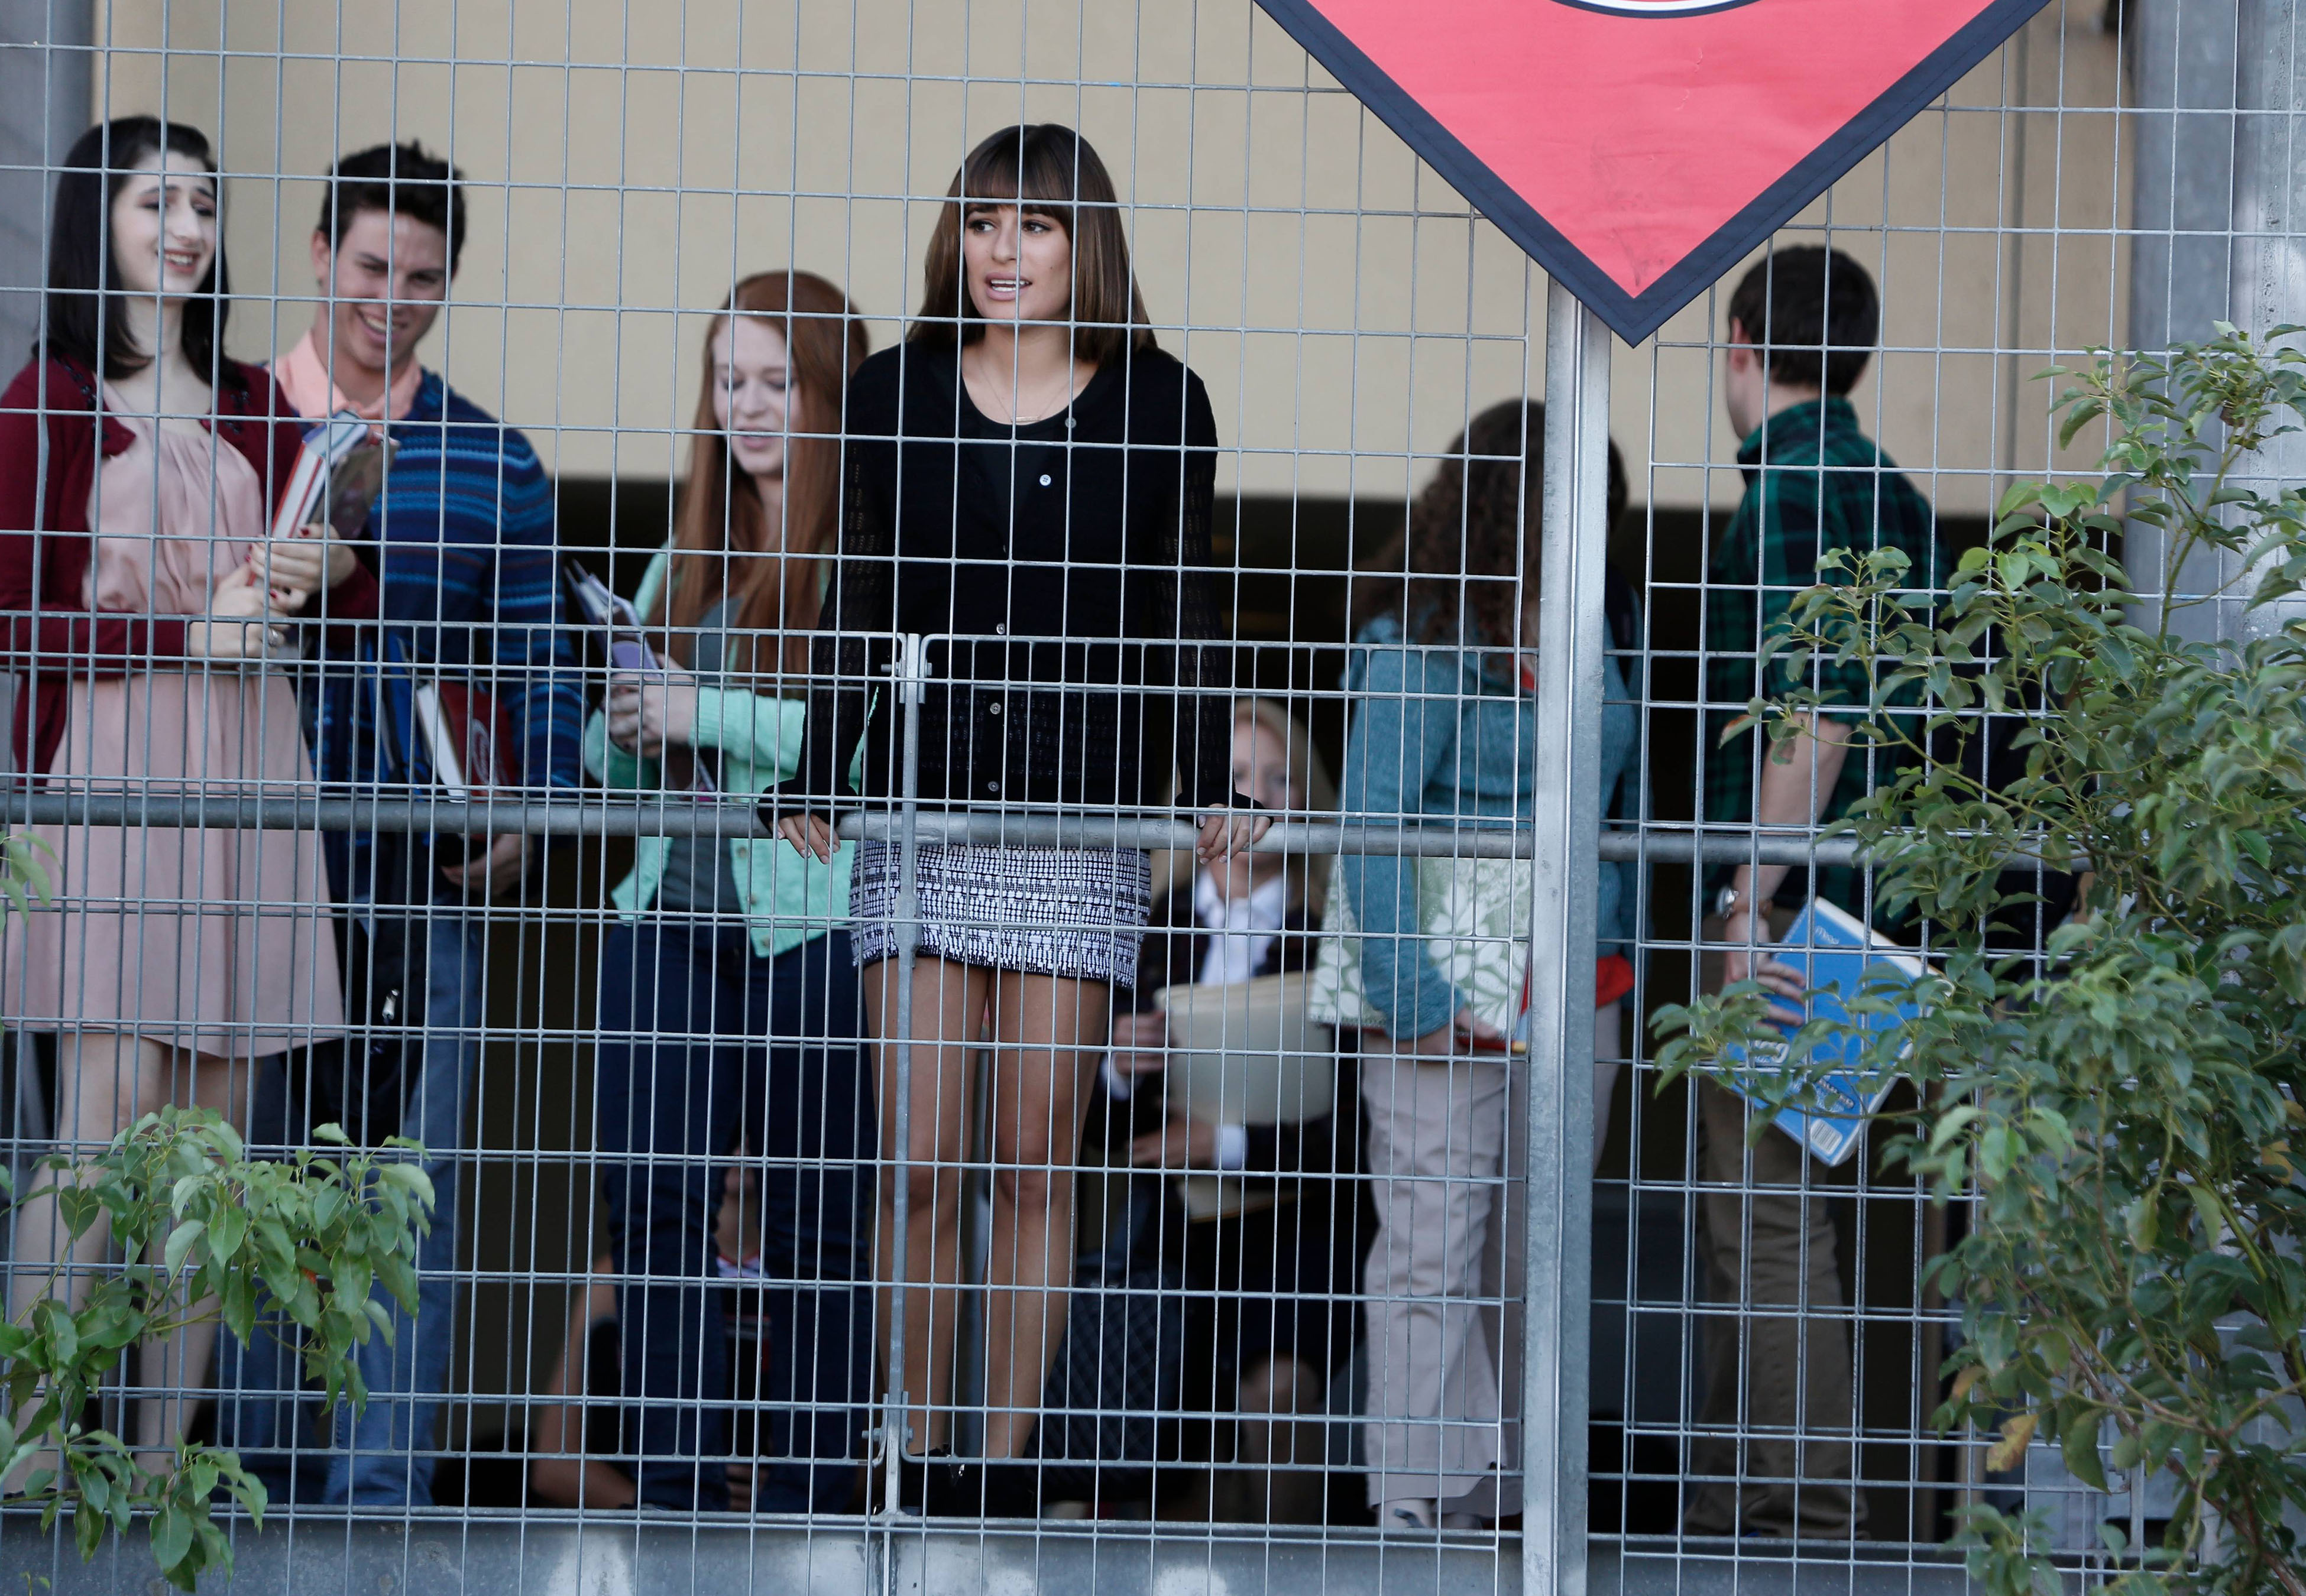 Glee Season 6 Image 4